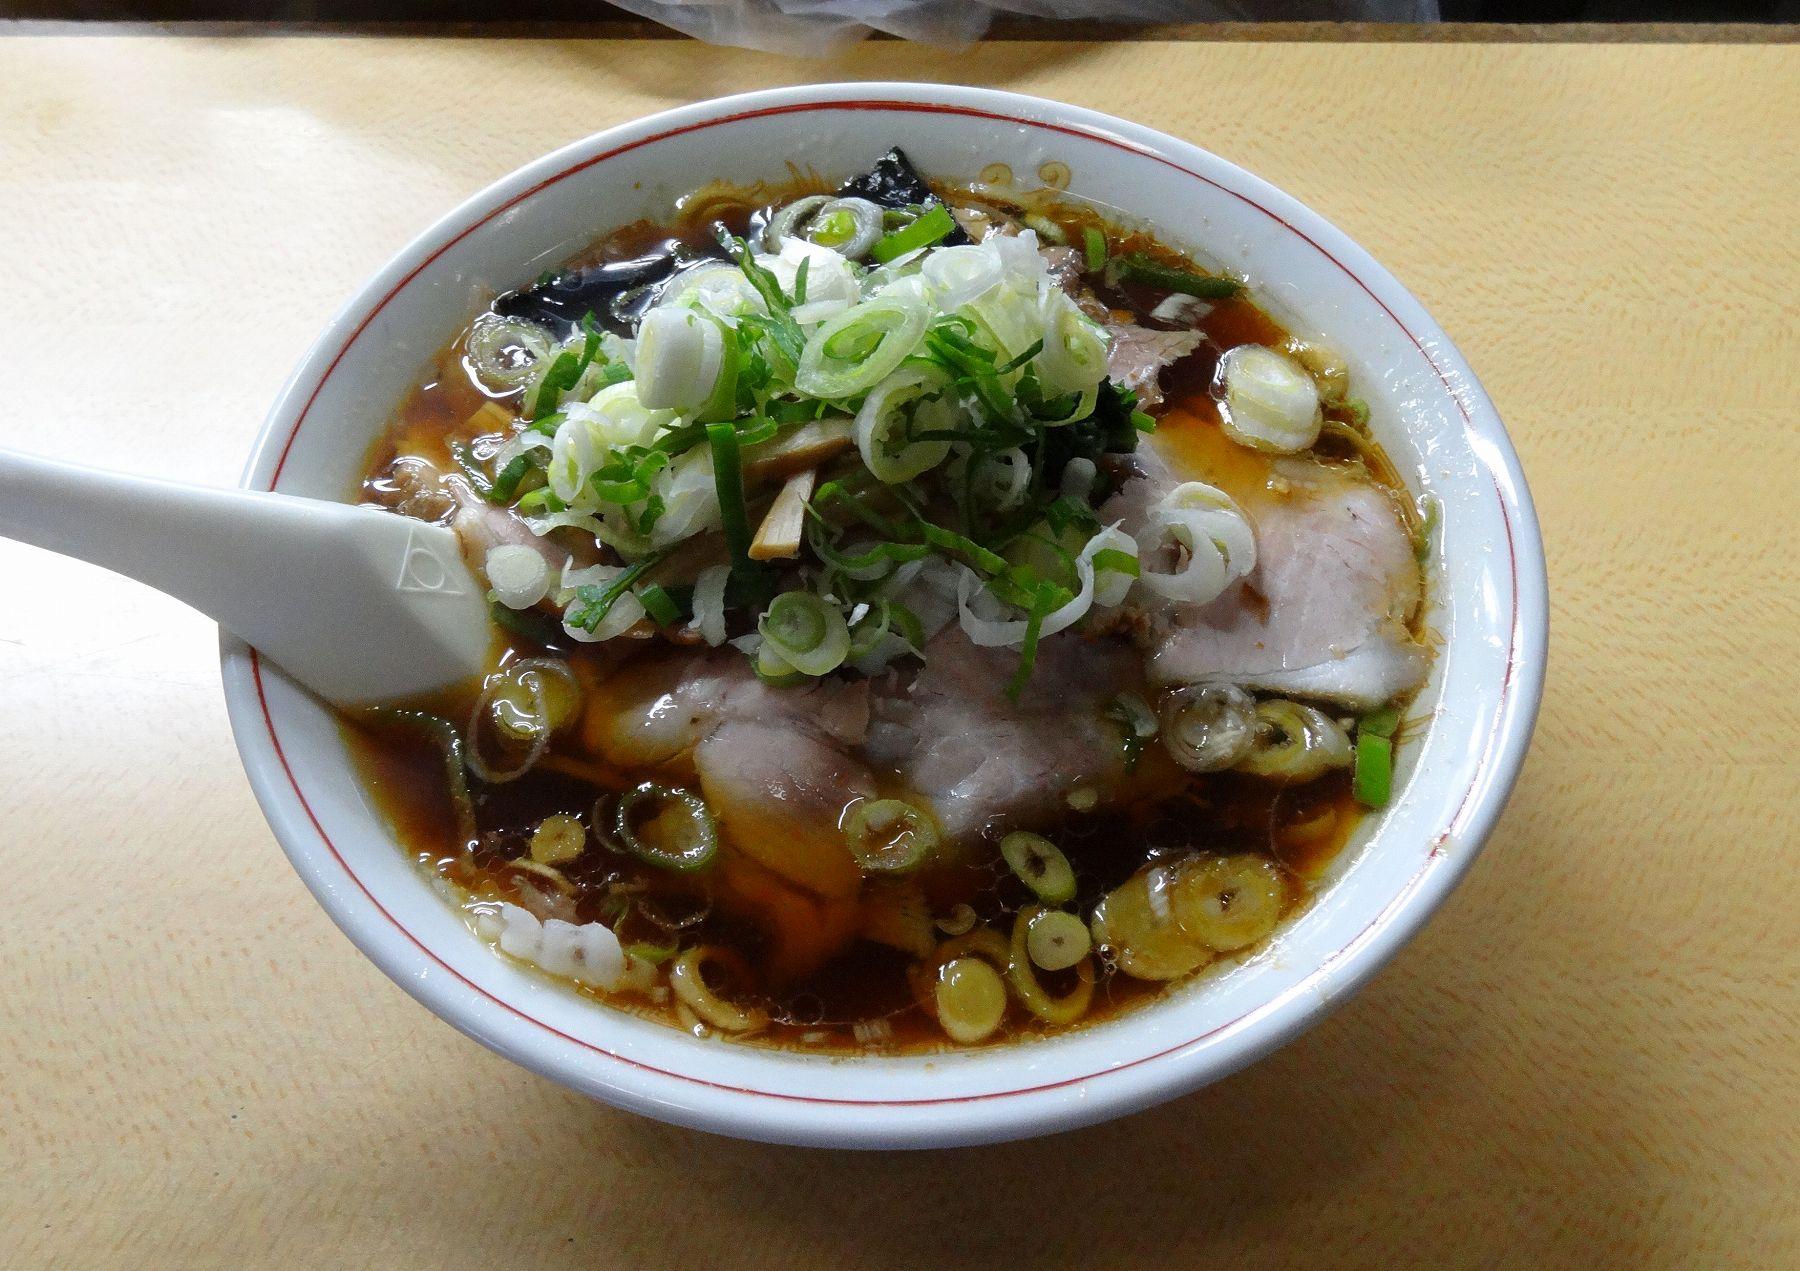 20121102002aoshima.jpg